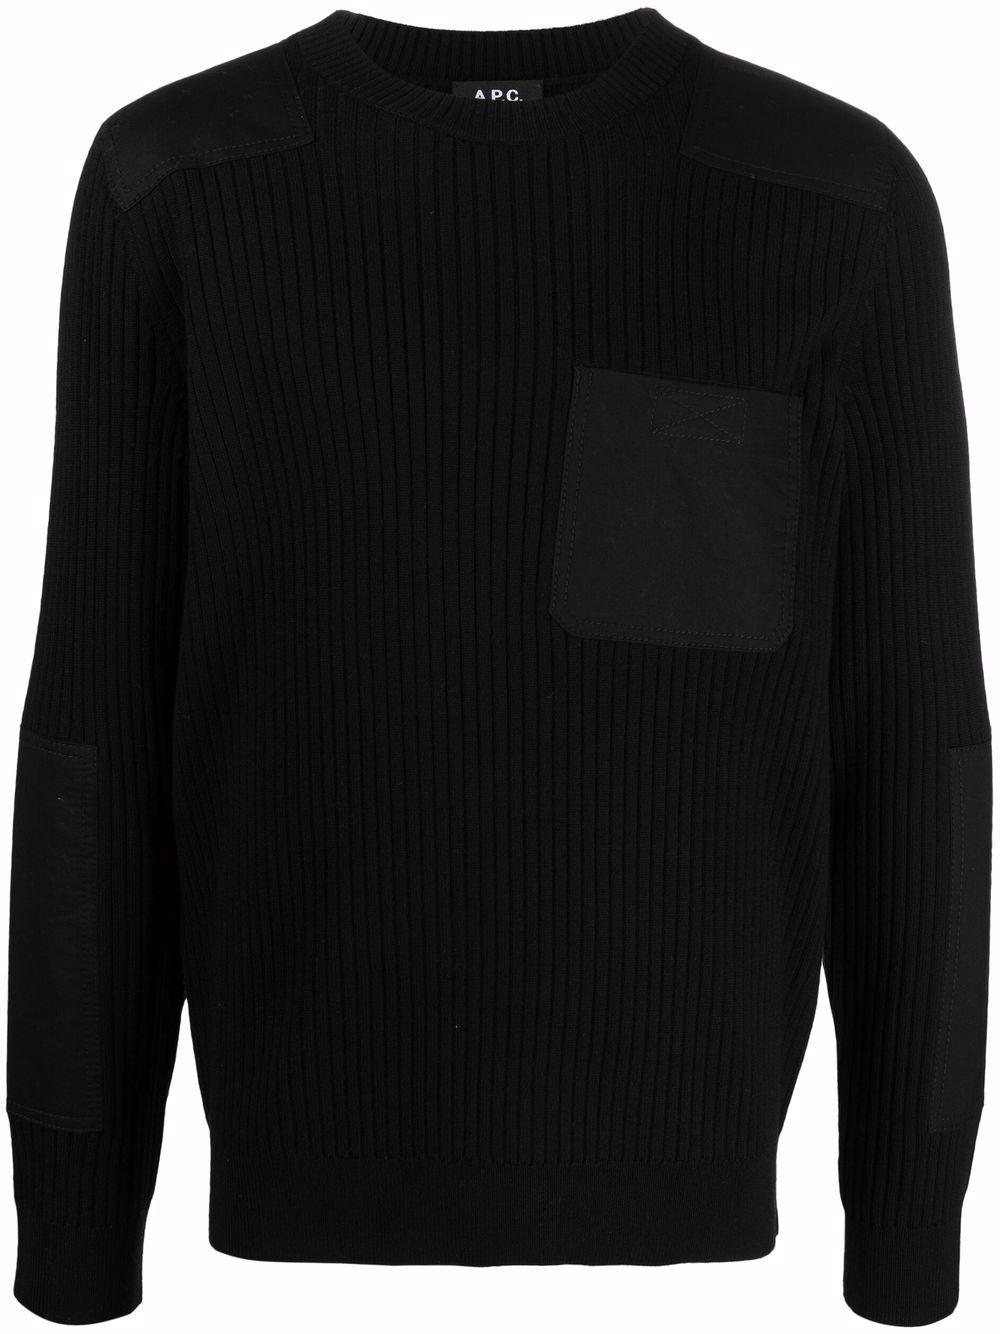 pull romain man black in wool A.P.C.   Sweaters   WVBAK-H23052LZZ